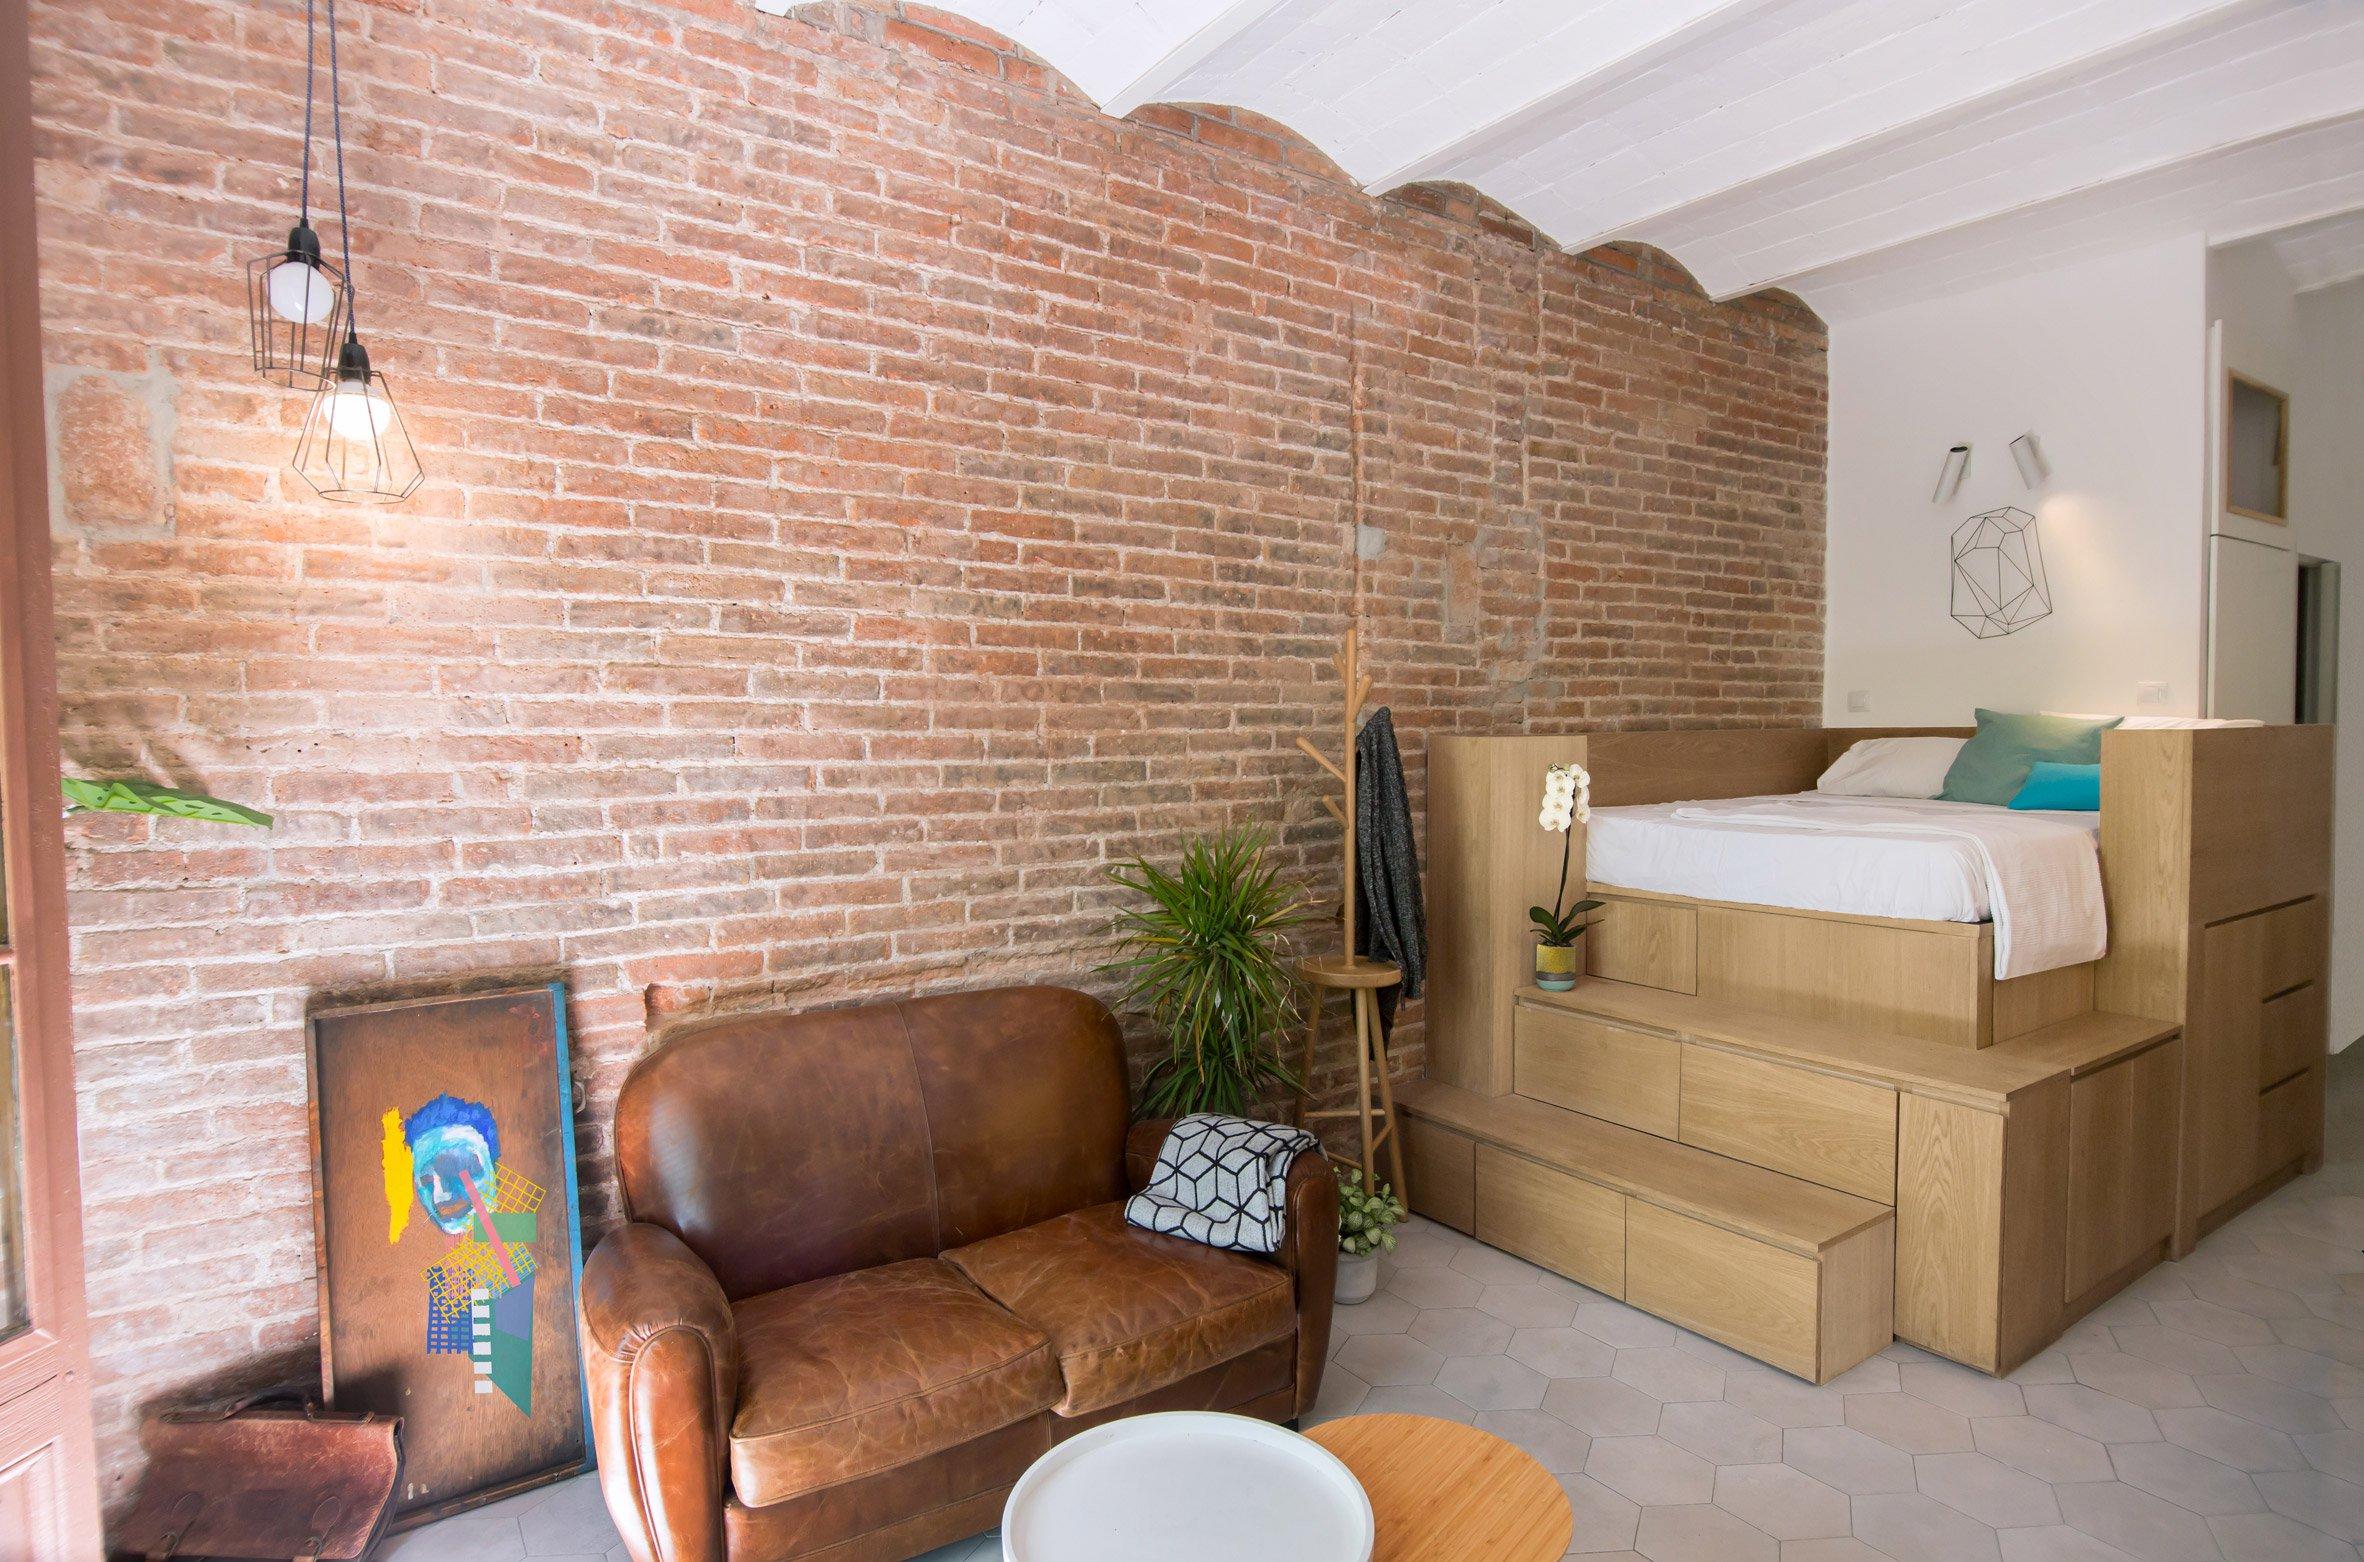 25m2-loft-barcelona-naimi-architecture-interiors-residential_dezeen_2364_col_2